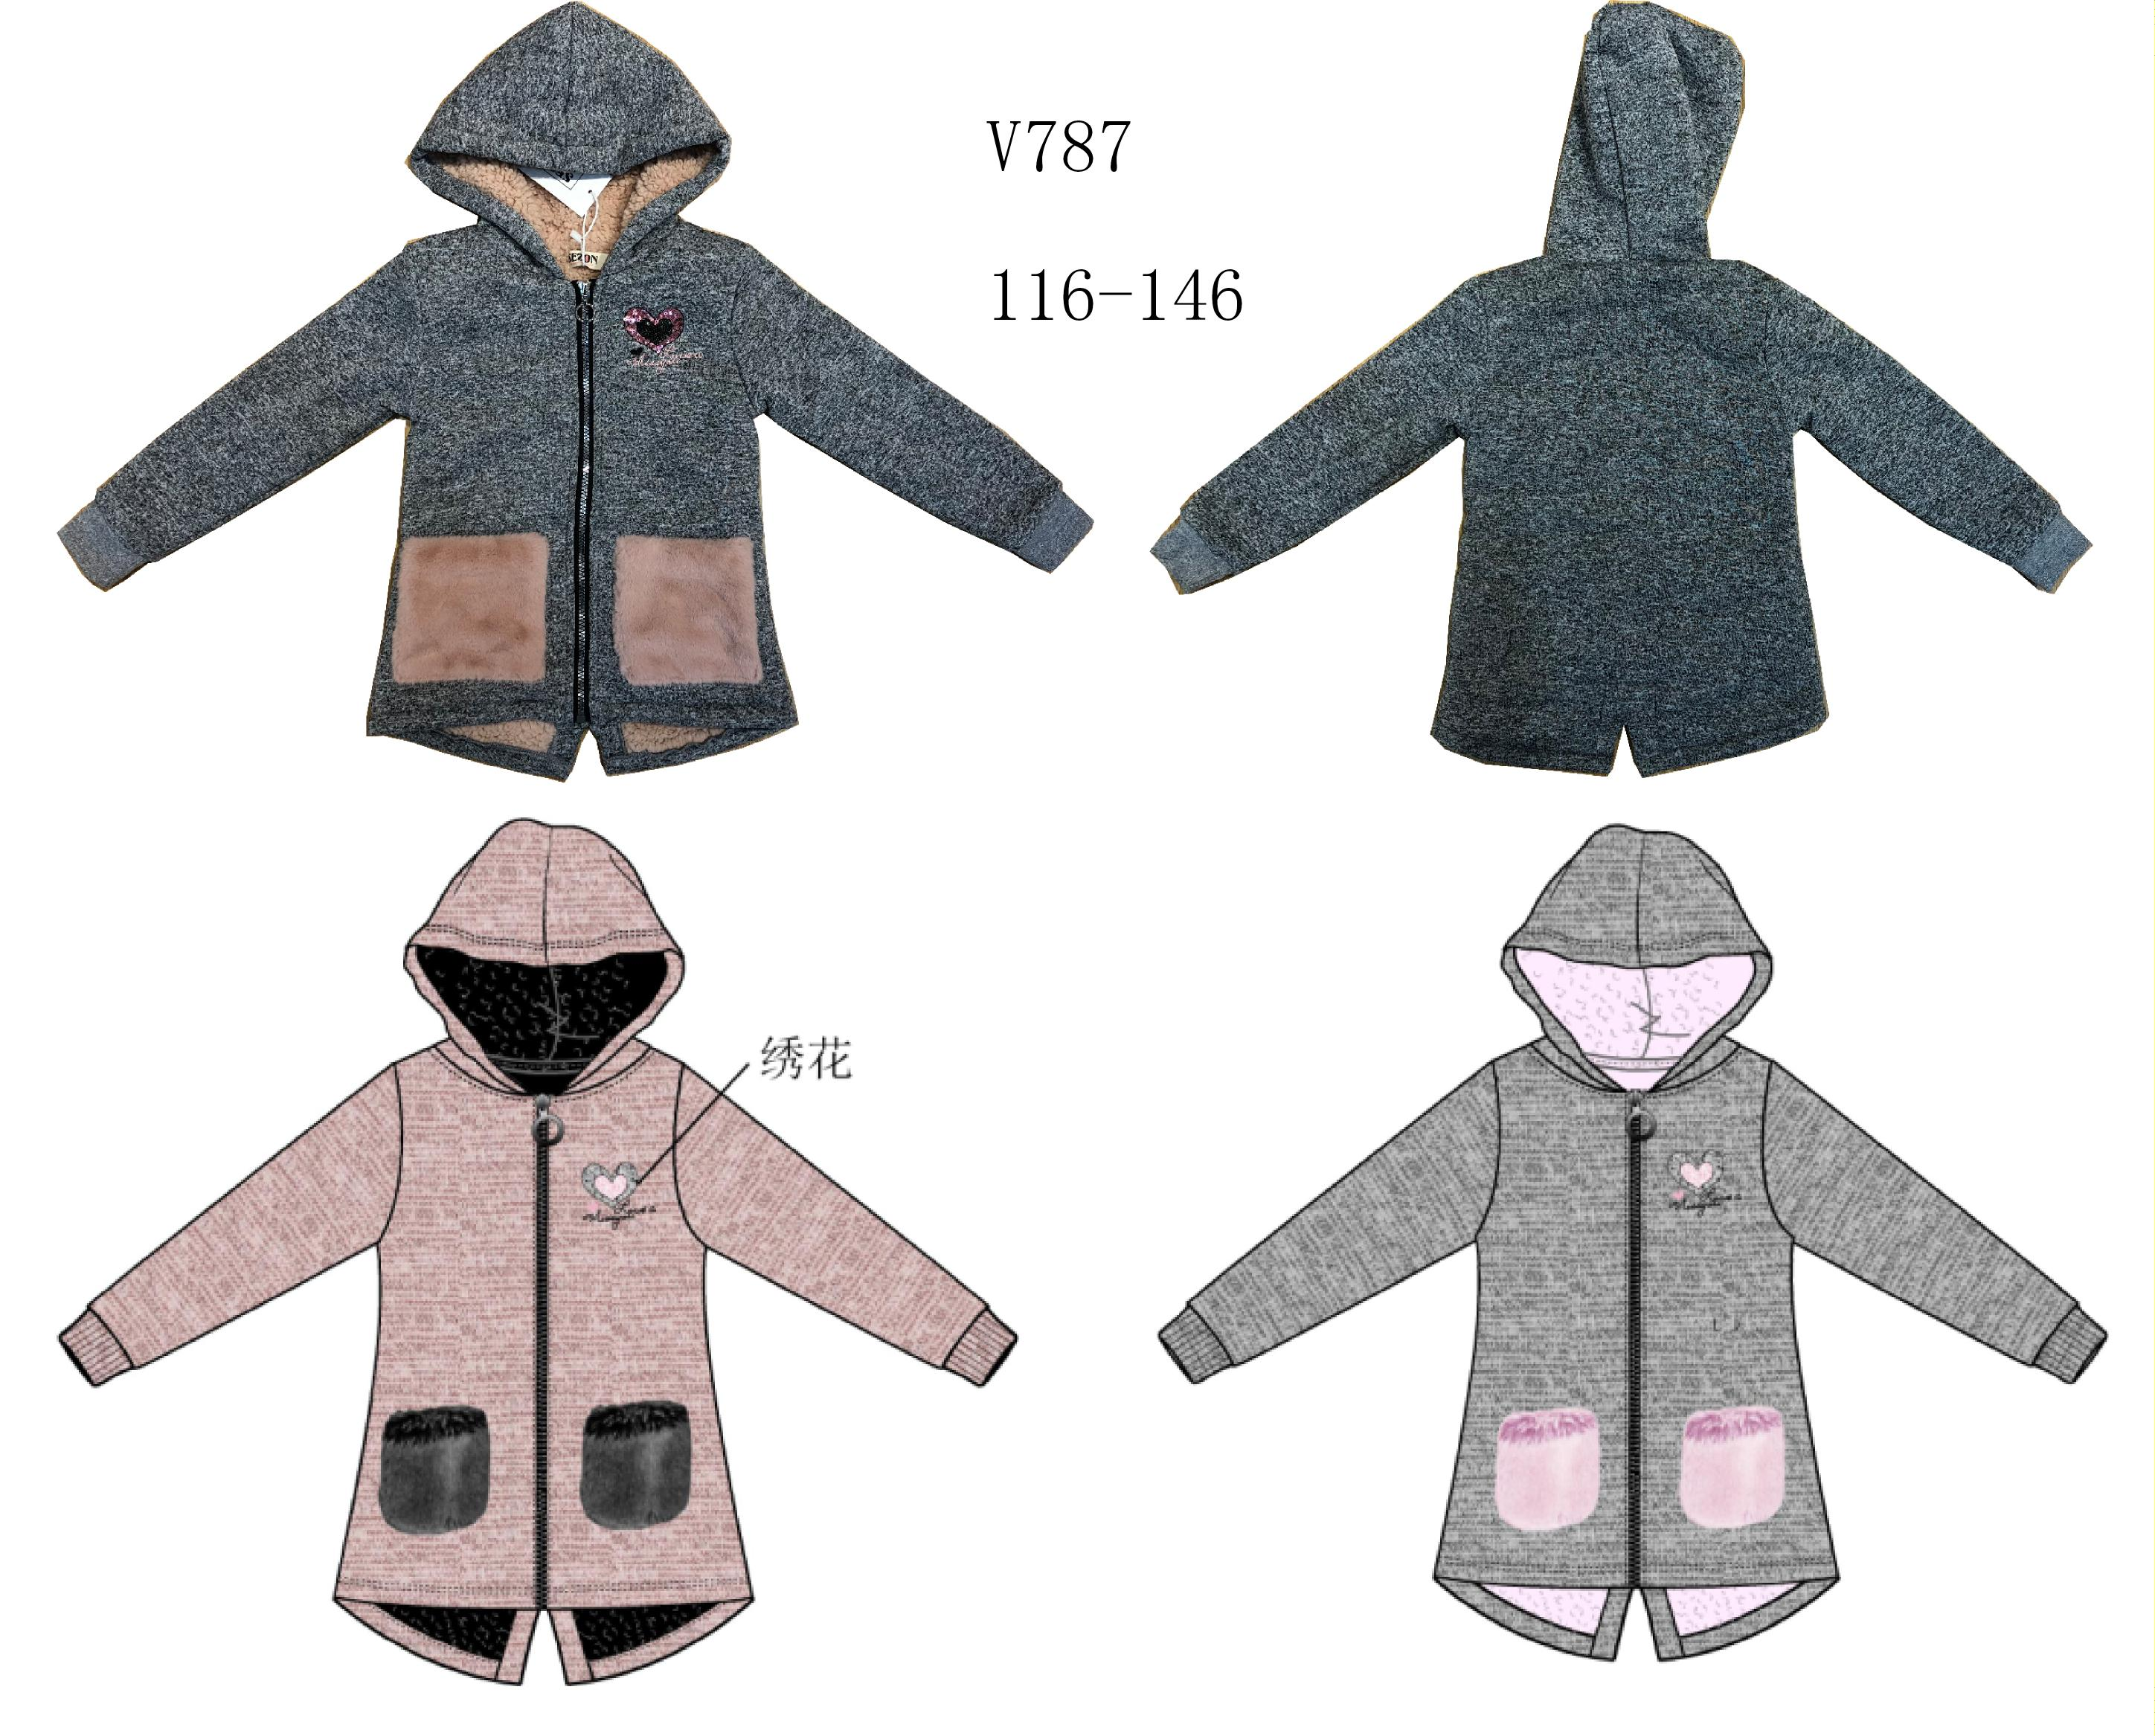 Dívčí mikino - bunda SEZON (116-146)